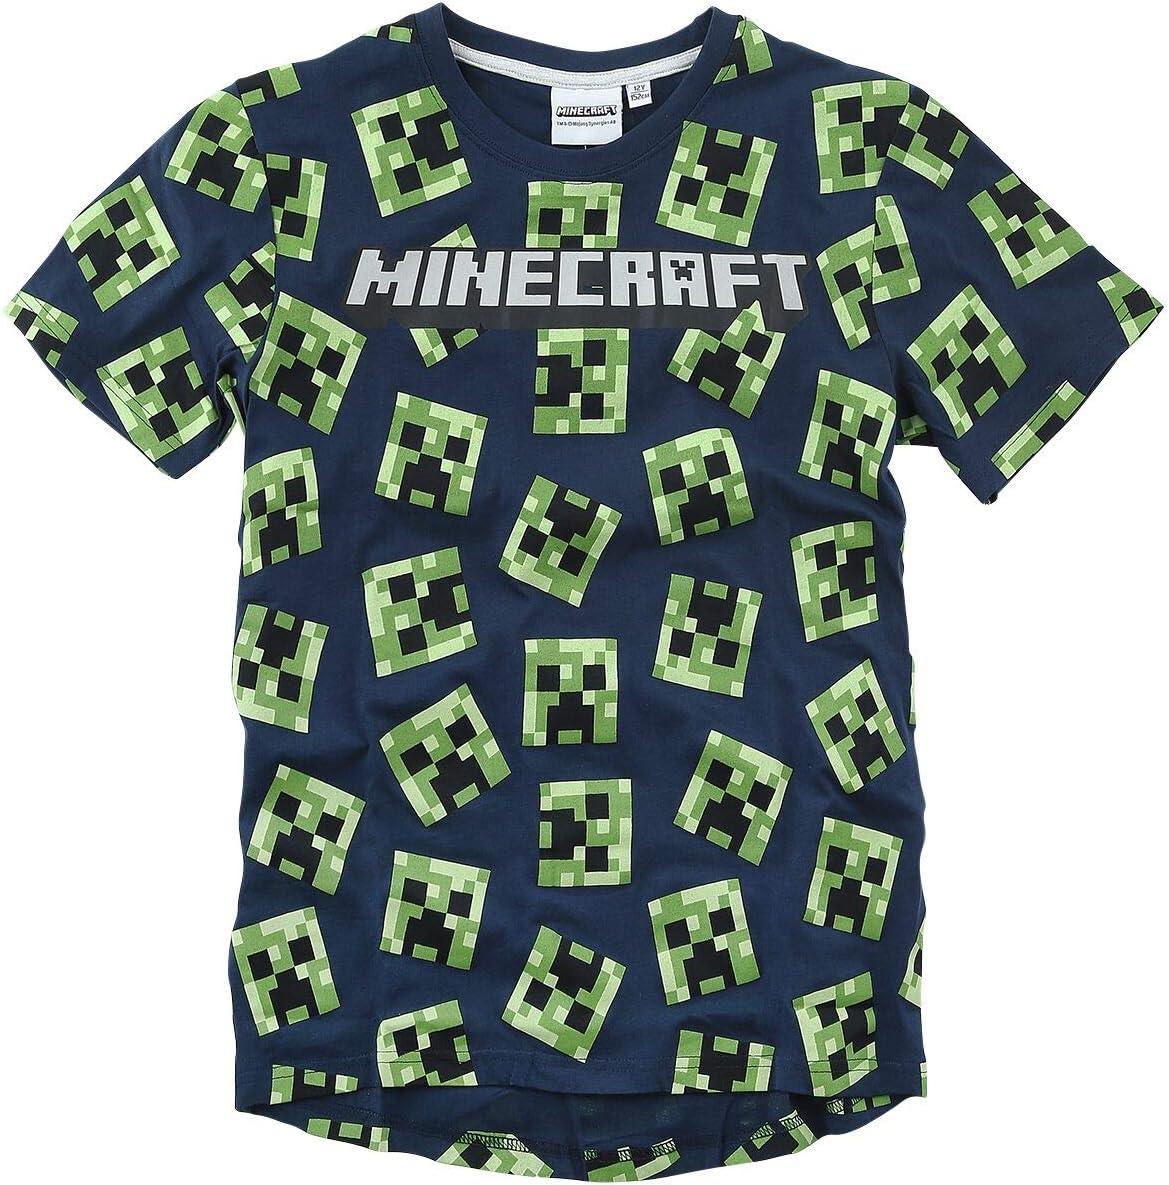 Minecraft Global Brands Group Camiseta T-Shirt Azul BLU Navy 100 Caras Creeper Cactus del Videojuego Original Oficial